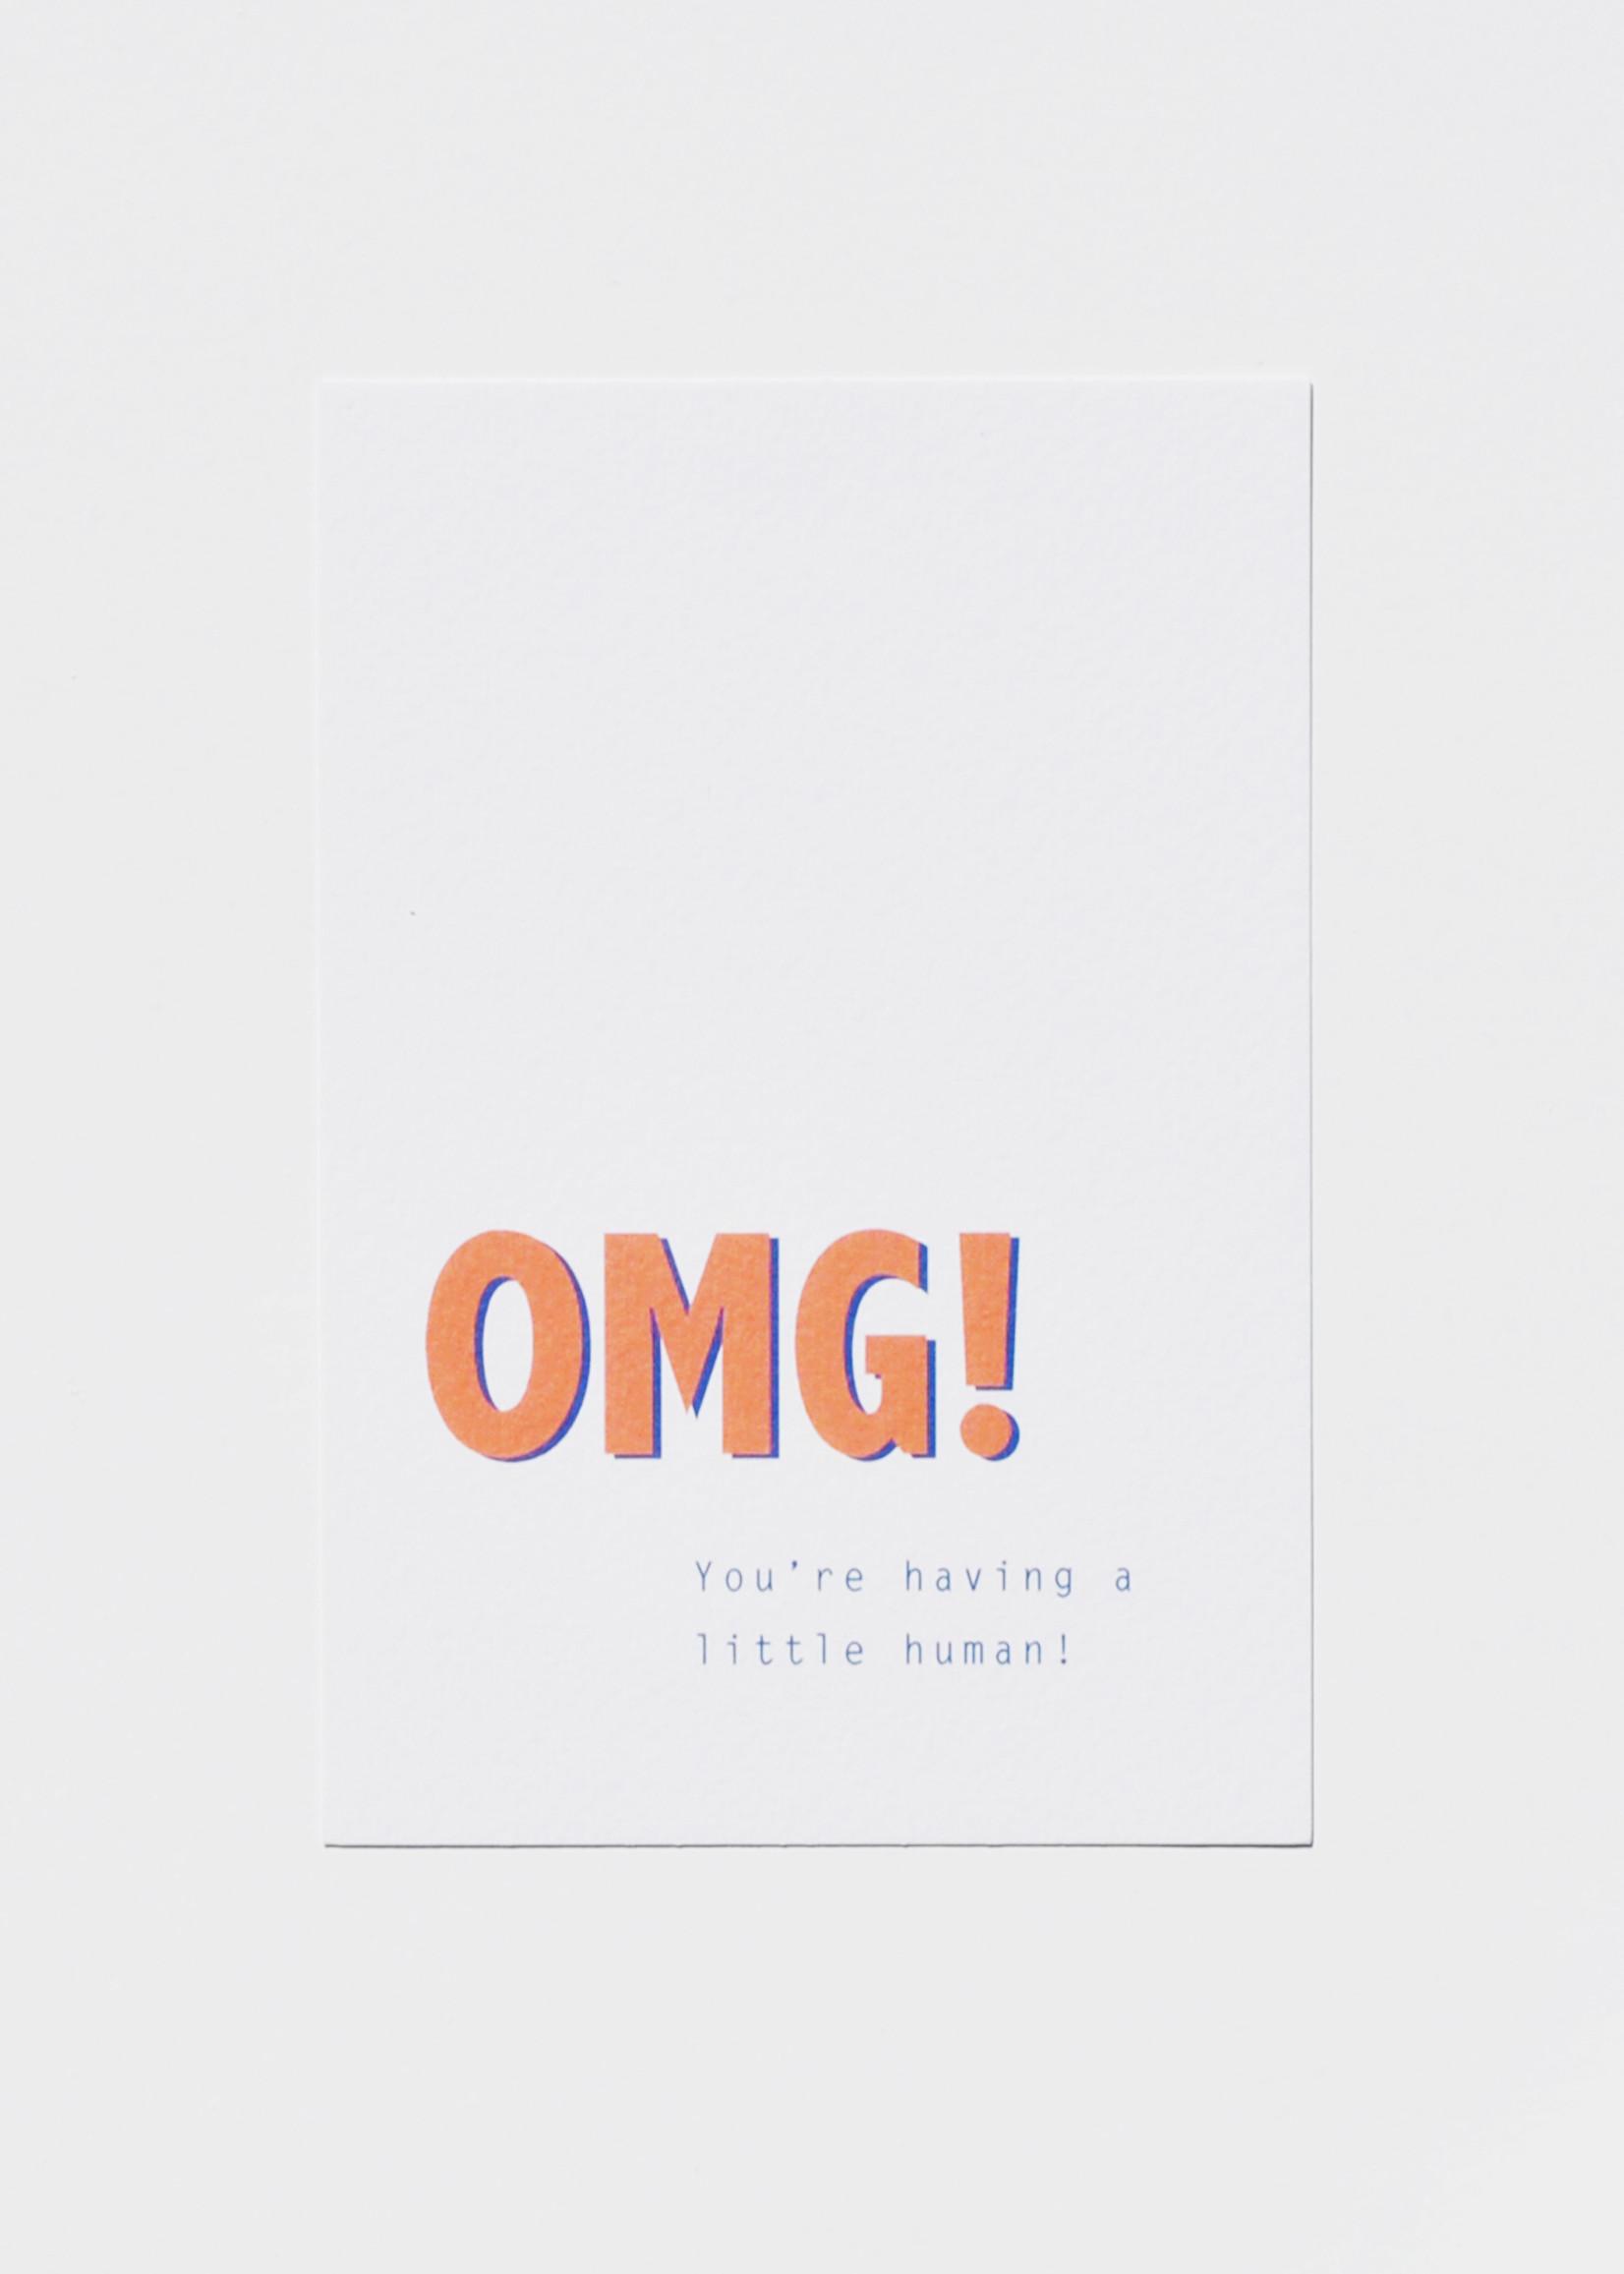 Mood card - OMG! you're having a little human!